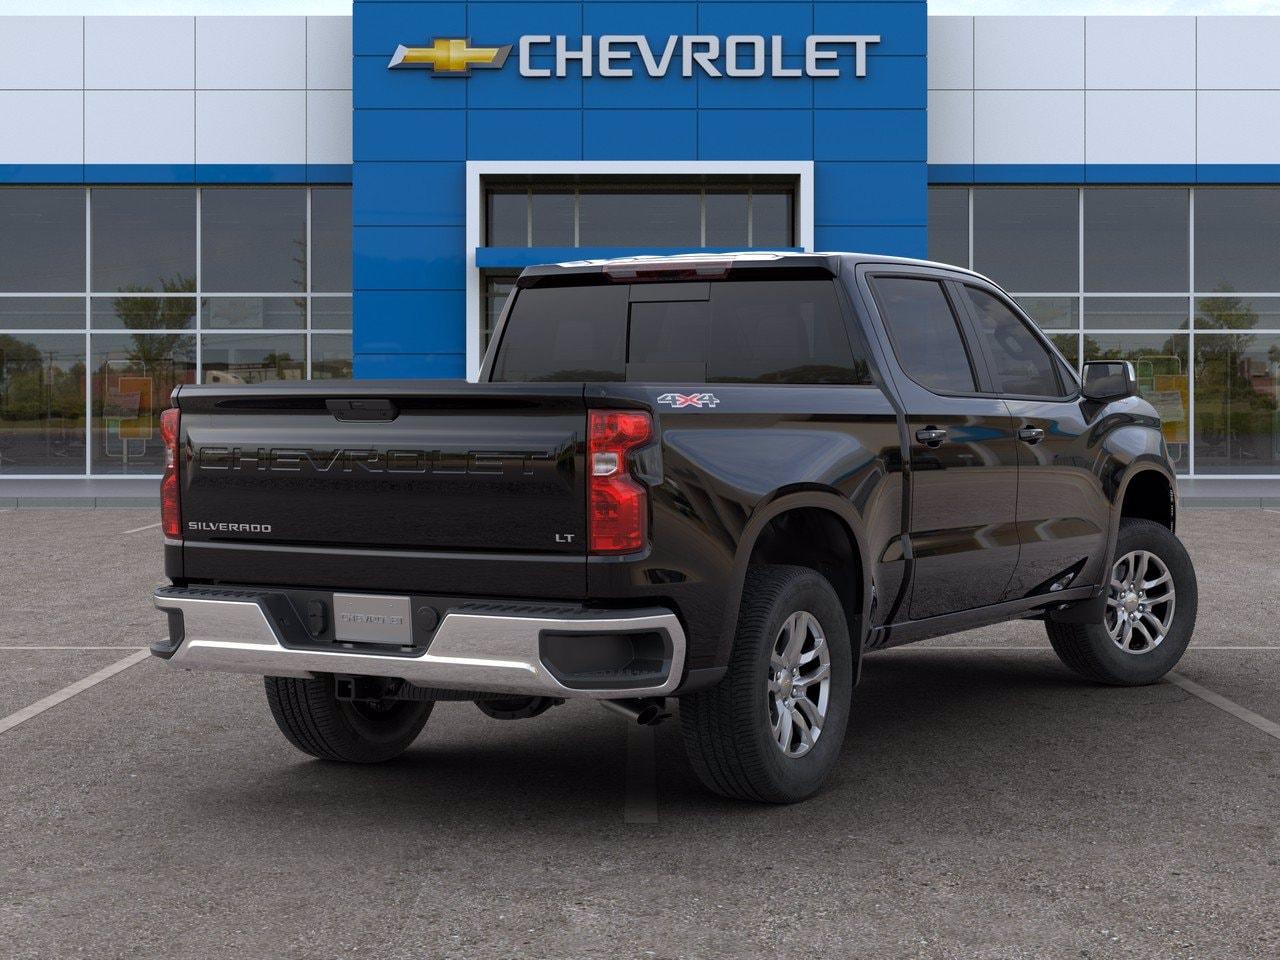 2020 Chevrolet Silverado 1500 Crew Cab 4x4, Pickup #C201762 - photo 2